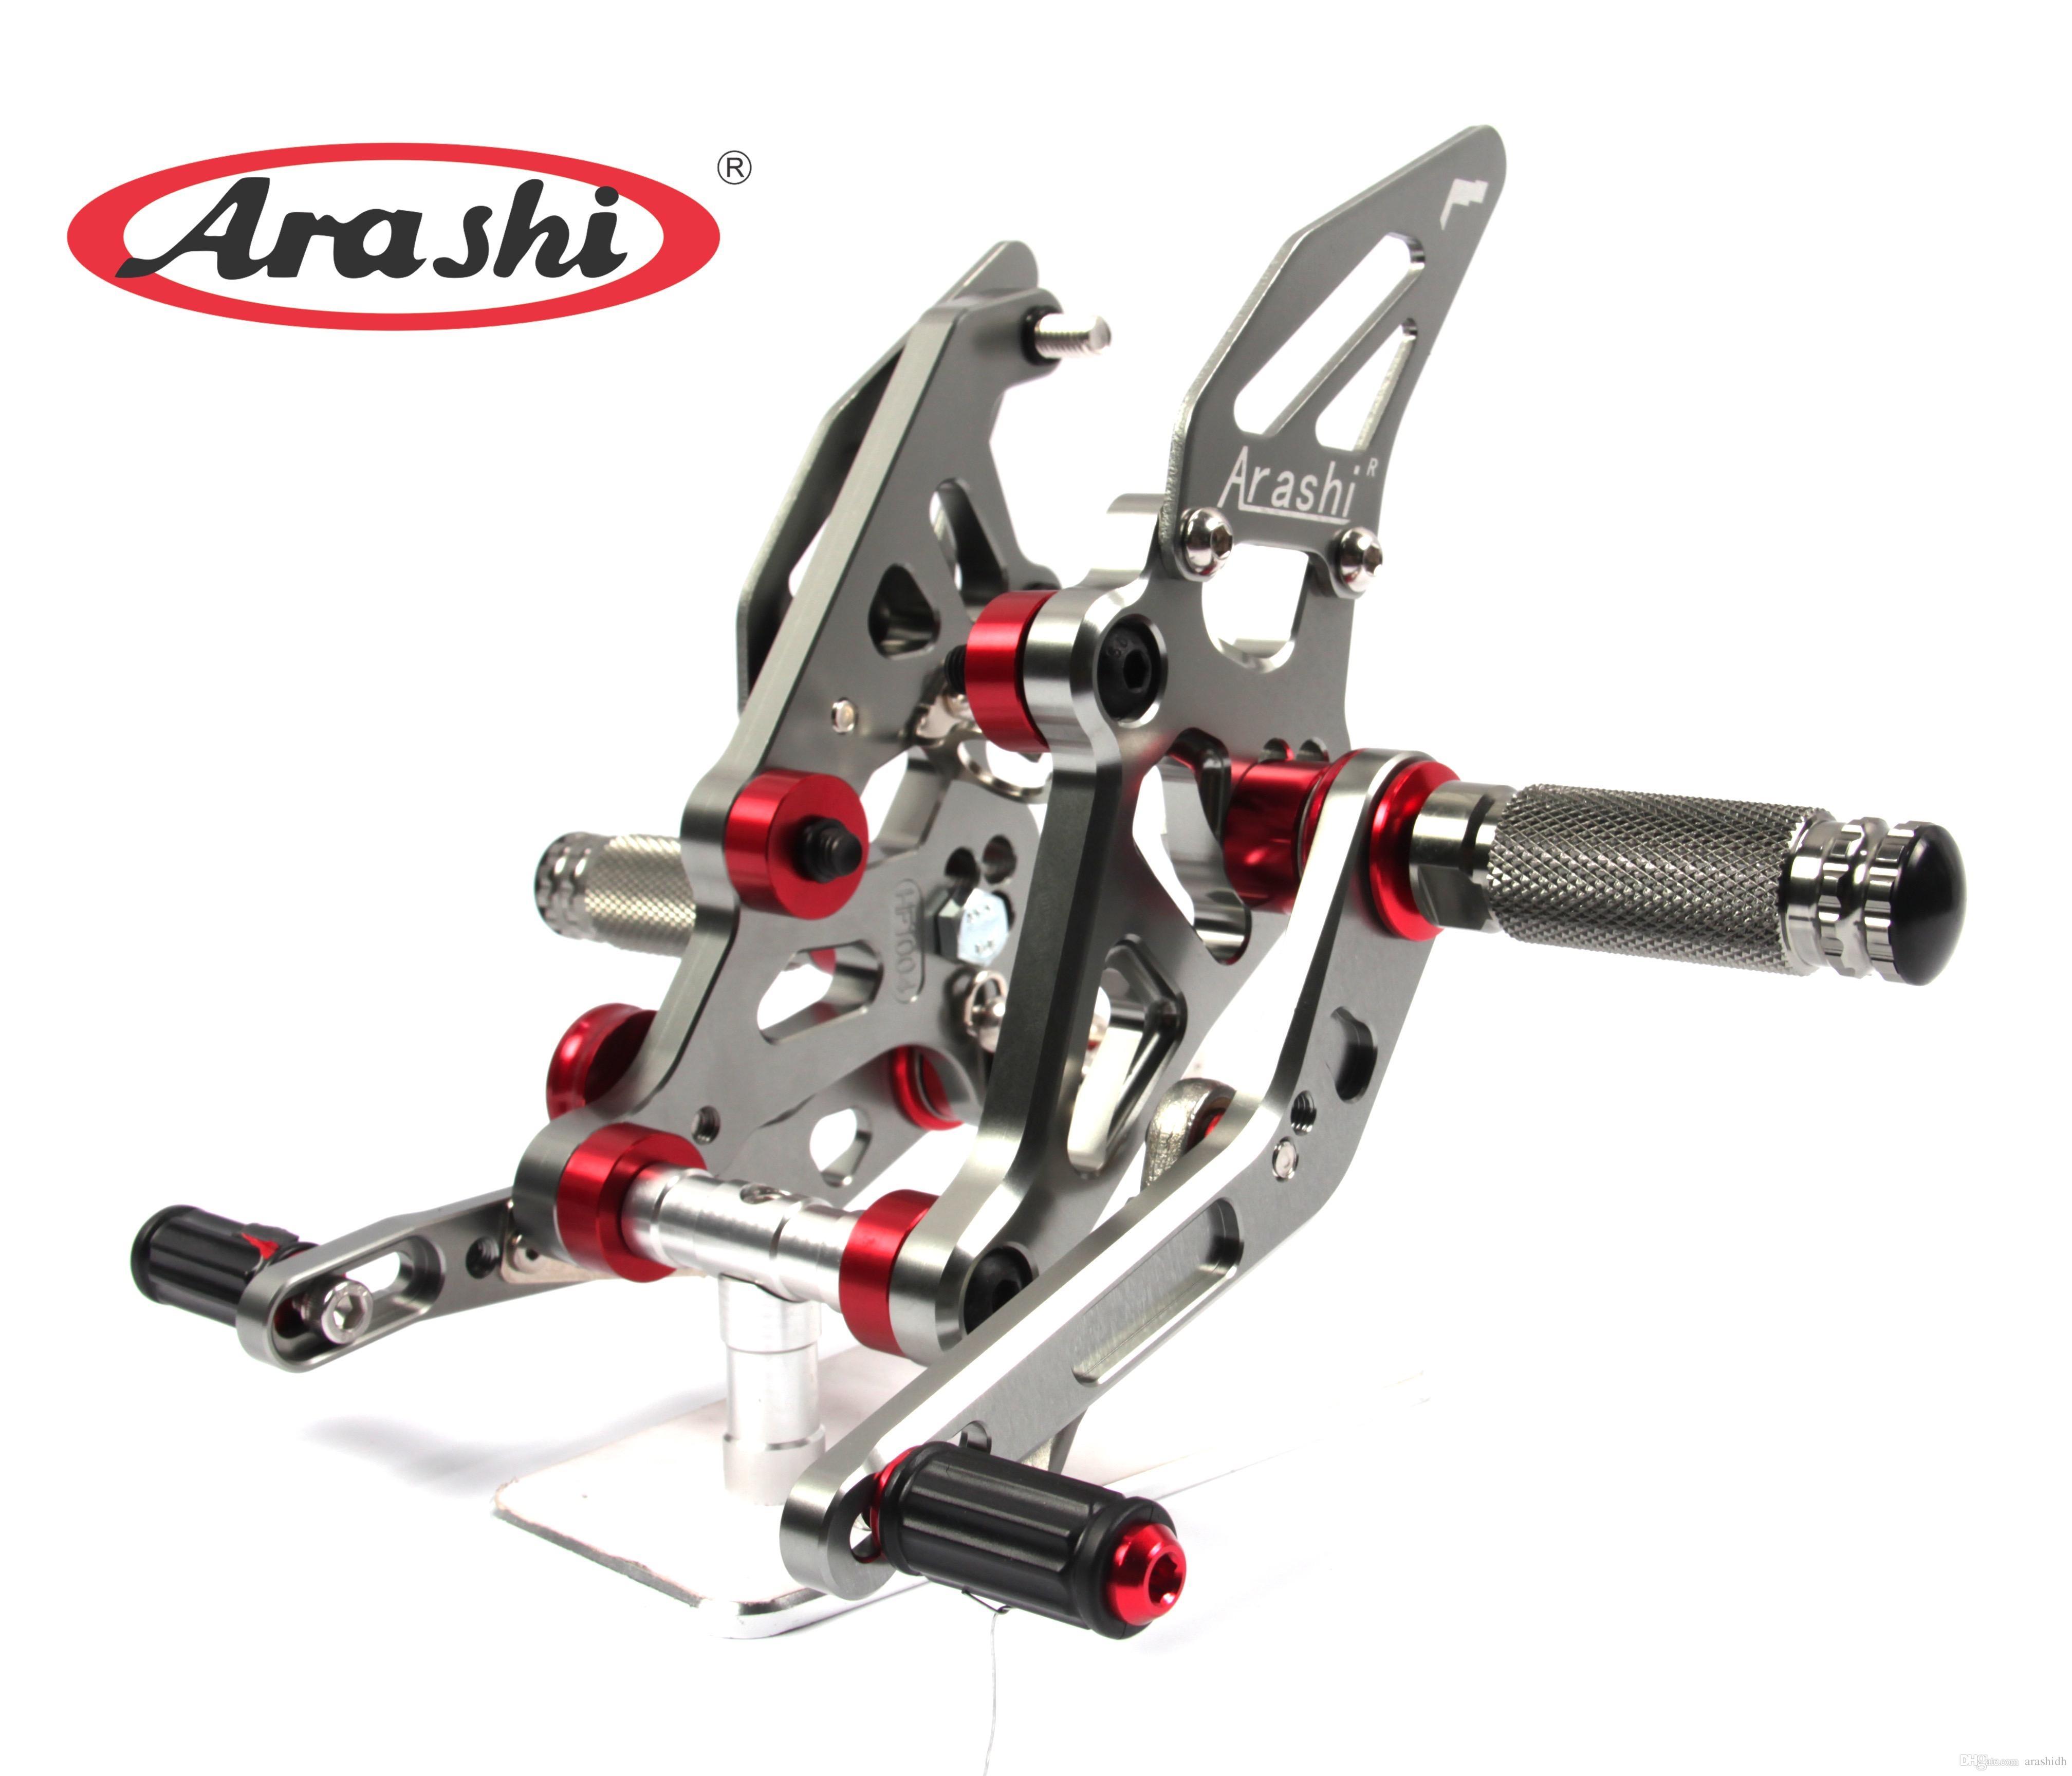 Arashi Rearsets Footrests FootPegs for YAMAHA MT07 FZ07 2014-2019 MT-07 FZ-07 Motorcycle Accessories Adjustable Foot Peg Rest 1 Set Black MT FZ 07 2015 2016 2017 2018